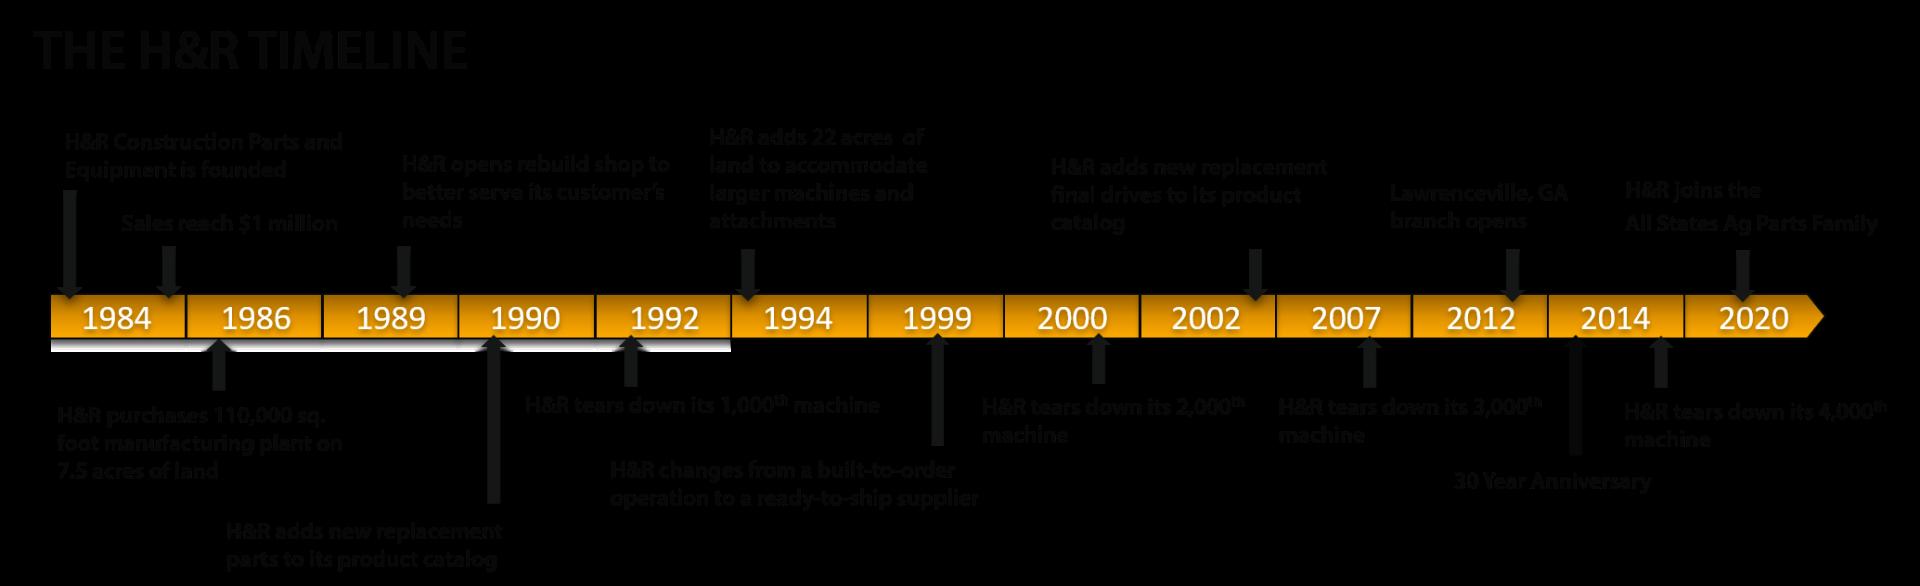 H&R Construction Equipment Parts Company Timeline